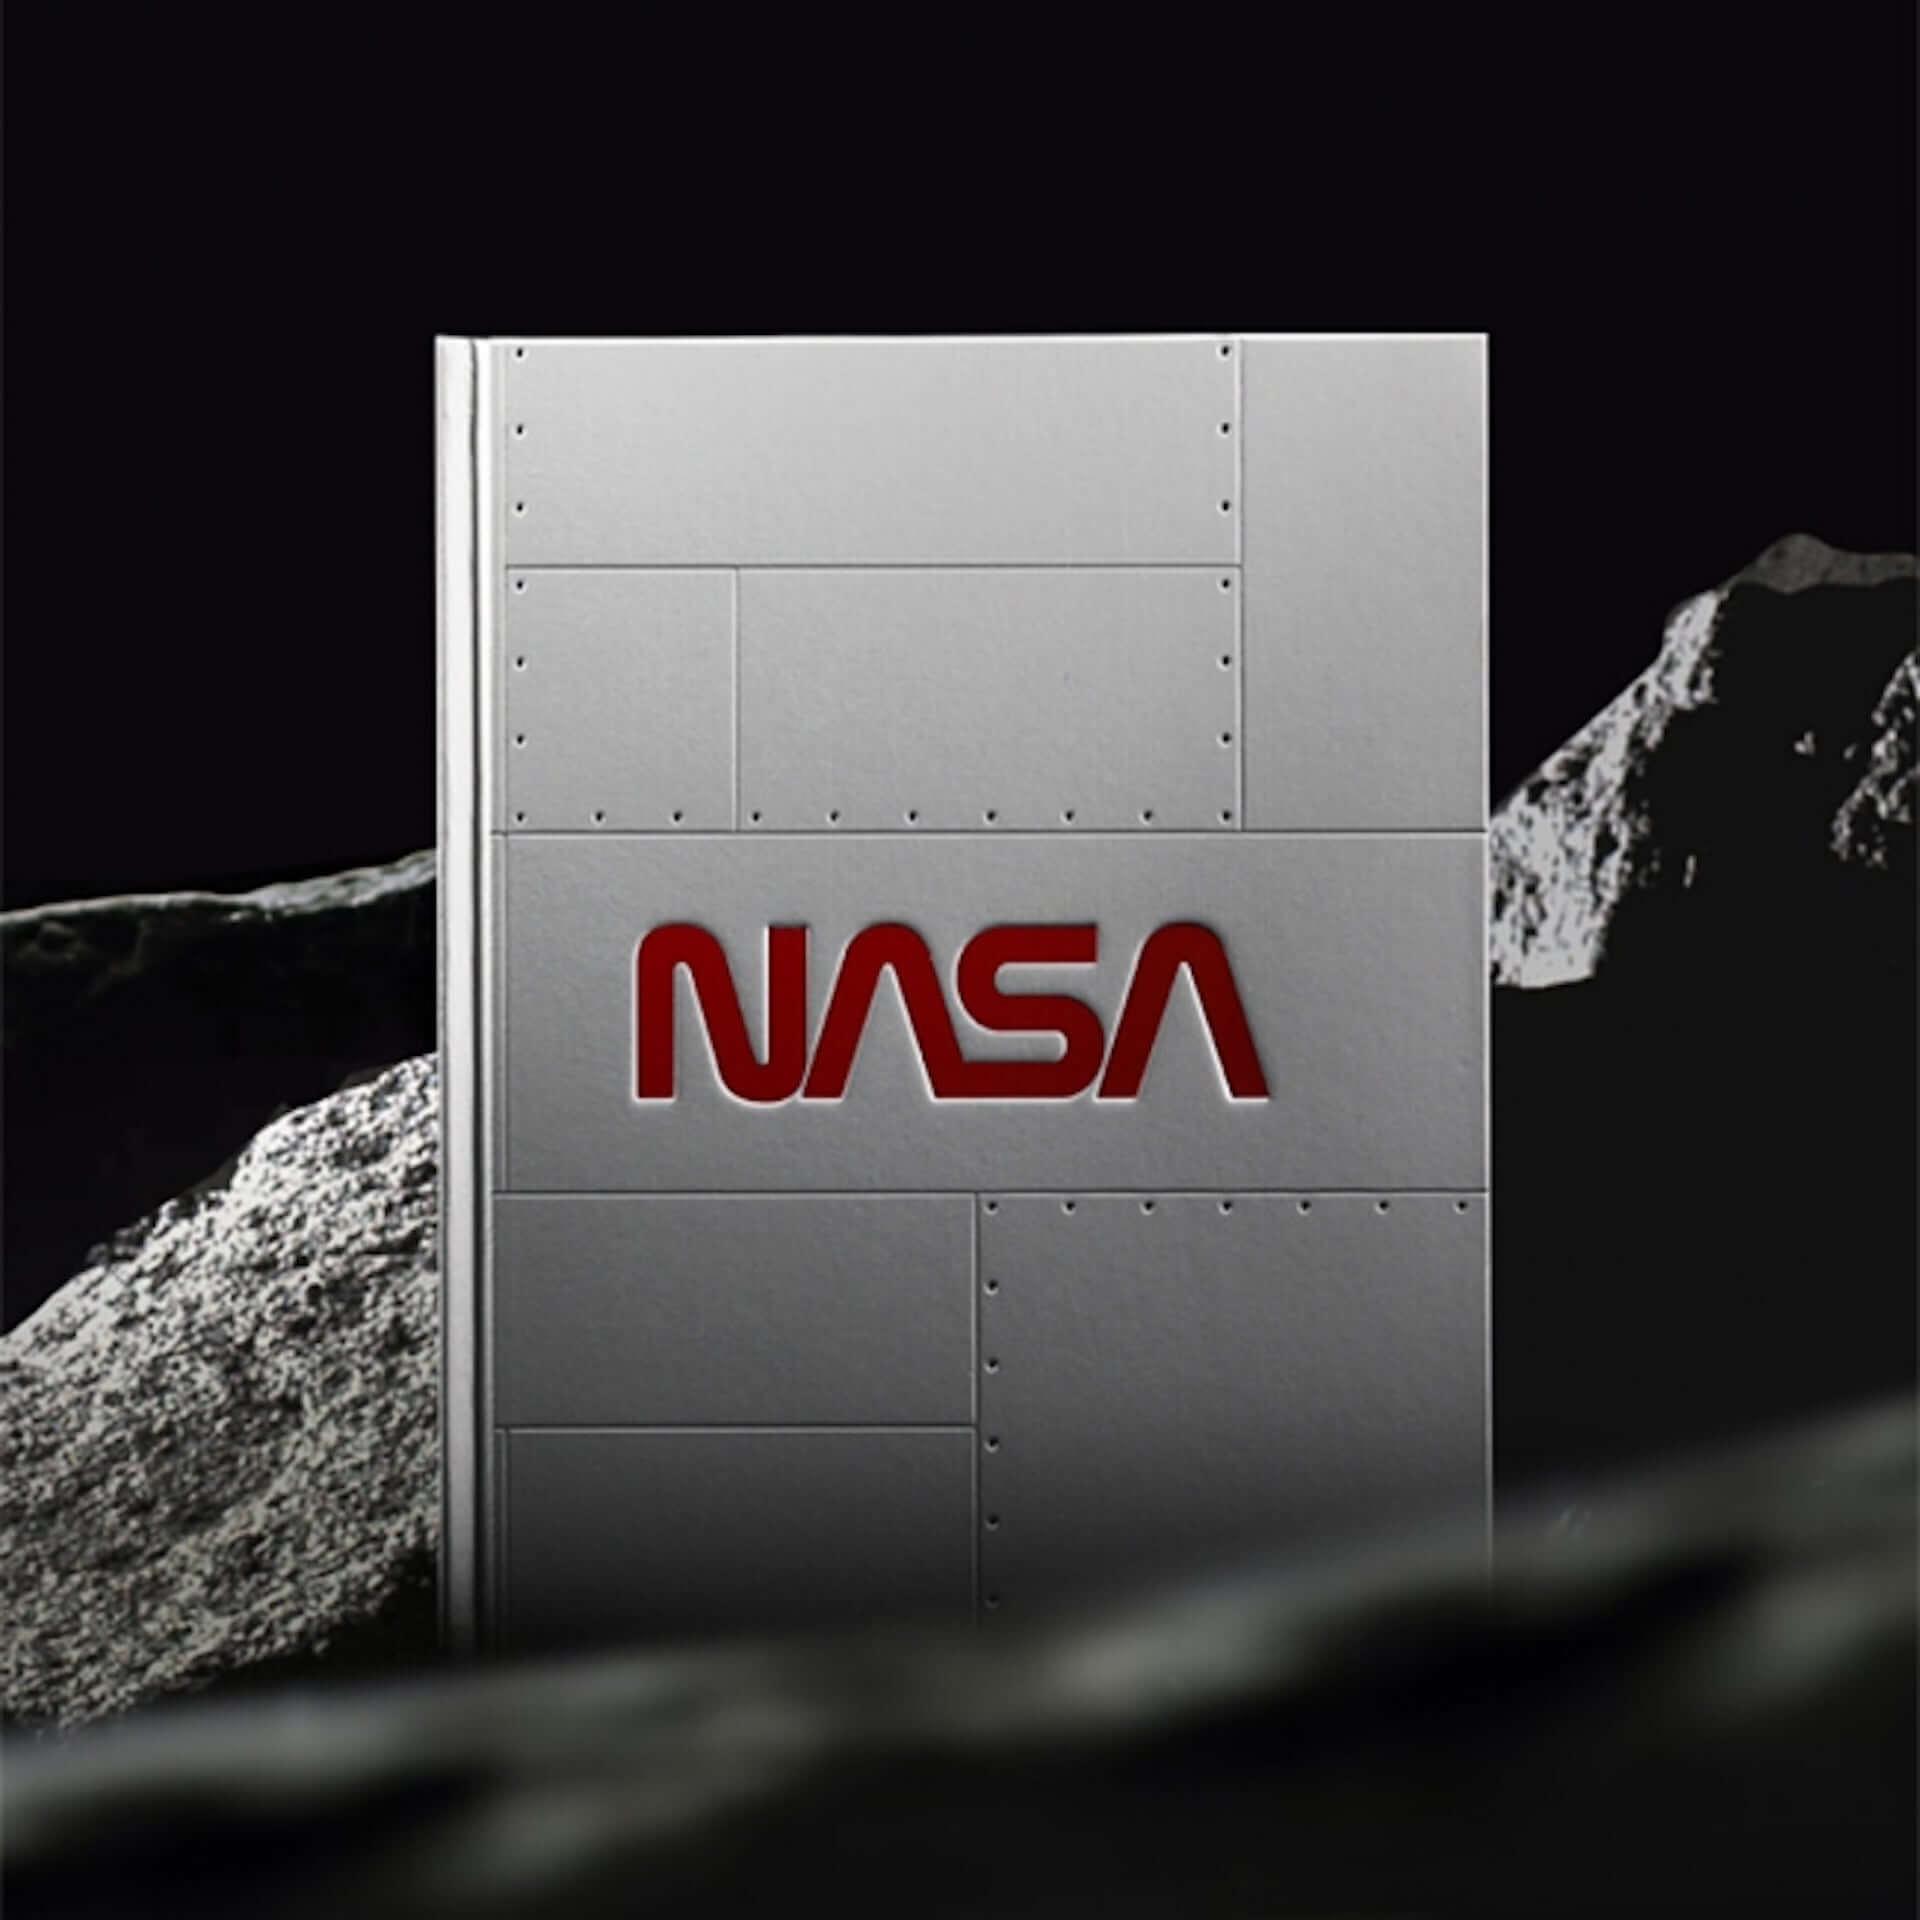 NASA公認&設立60周年記念のARマグカップ!宇宙船からの眺めを体験できる『Space Mug』がGLOTURE.JPに再入荷 tech200729_gloture_5-1920x1920